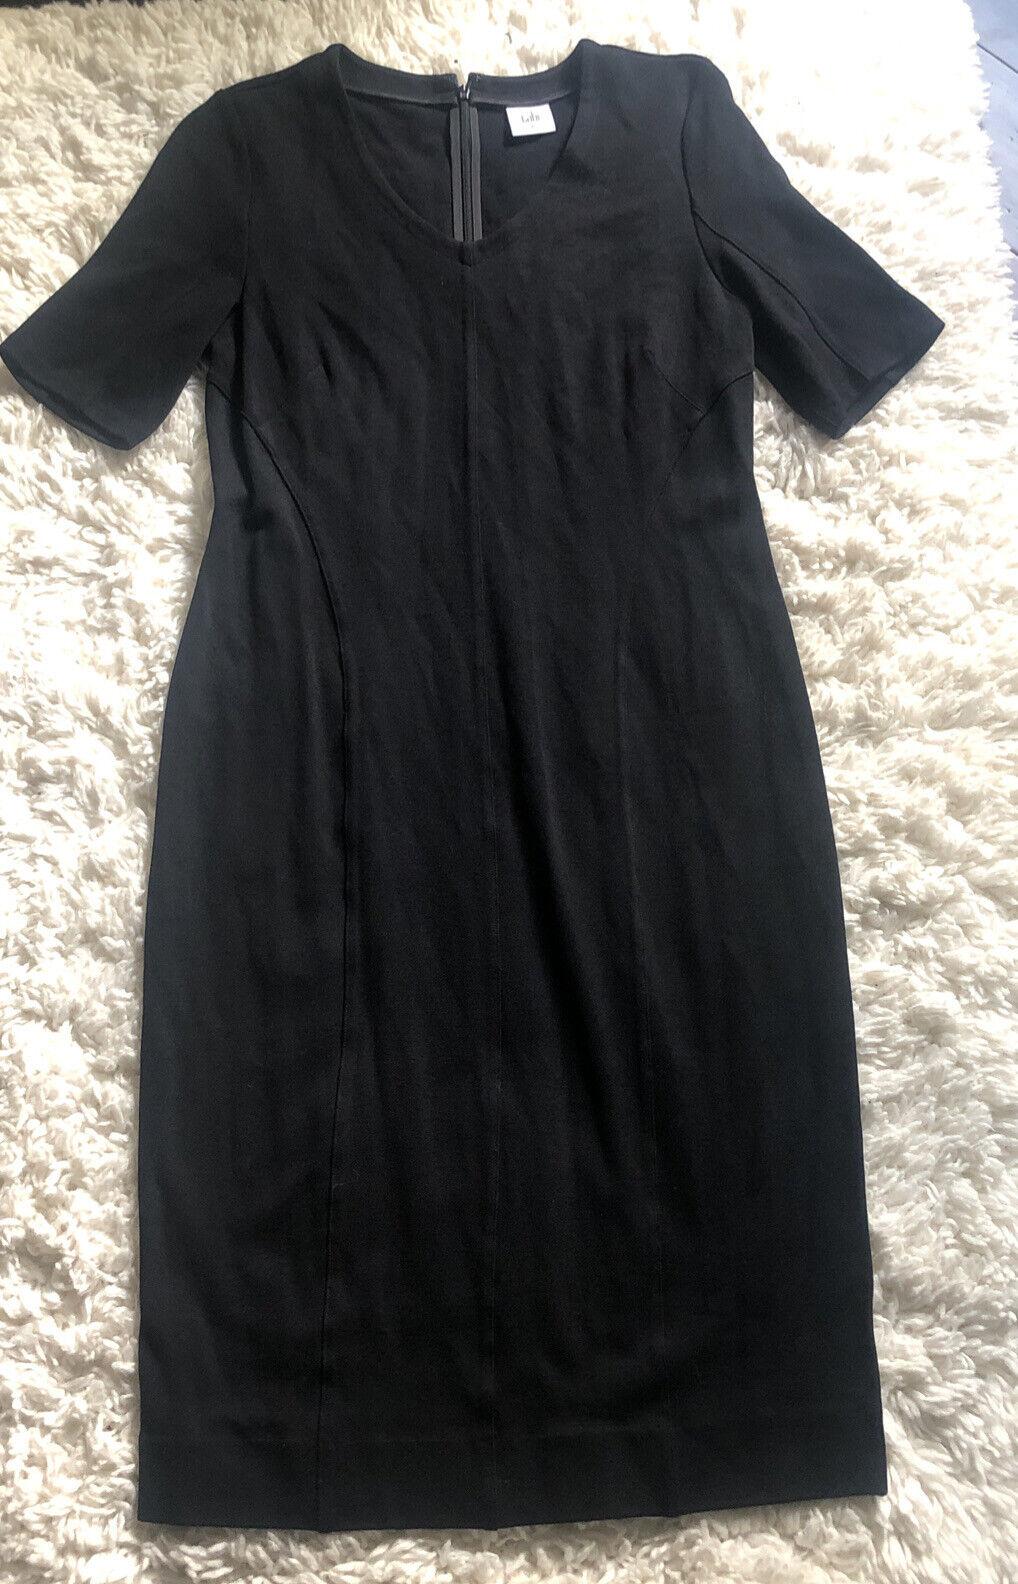 Cabi Claire Modern Sheath Dress q Black Ponte Kni… - image 2